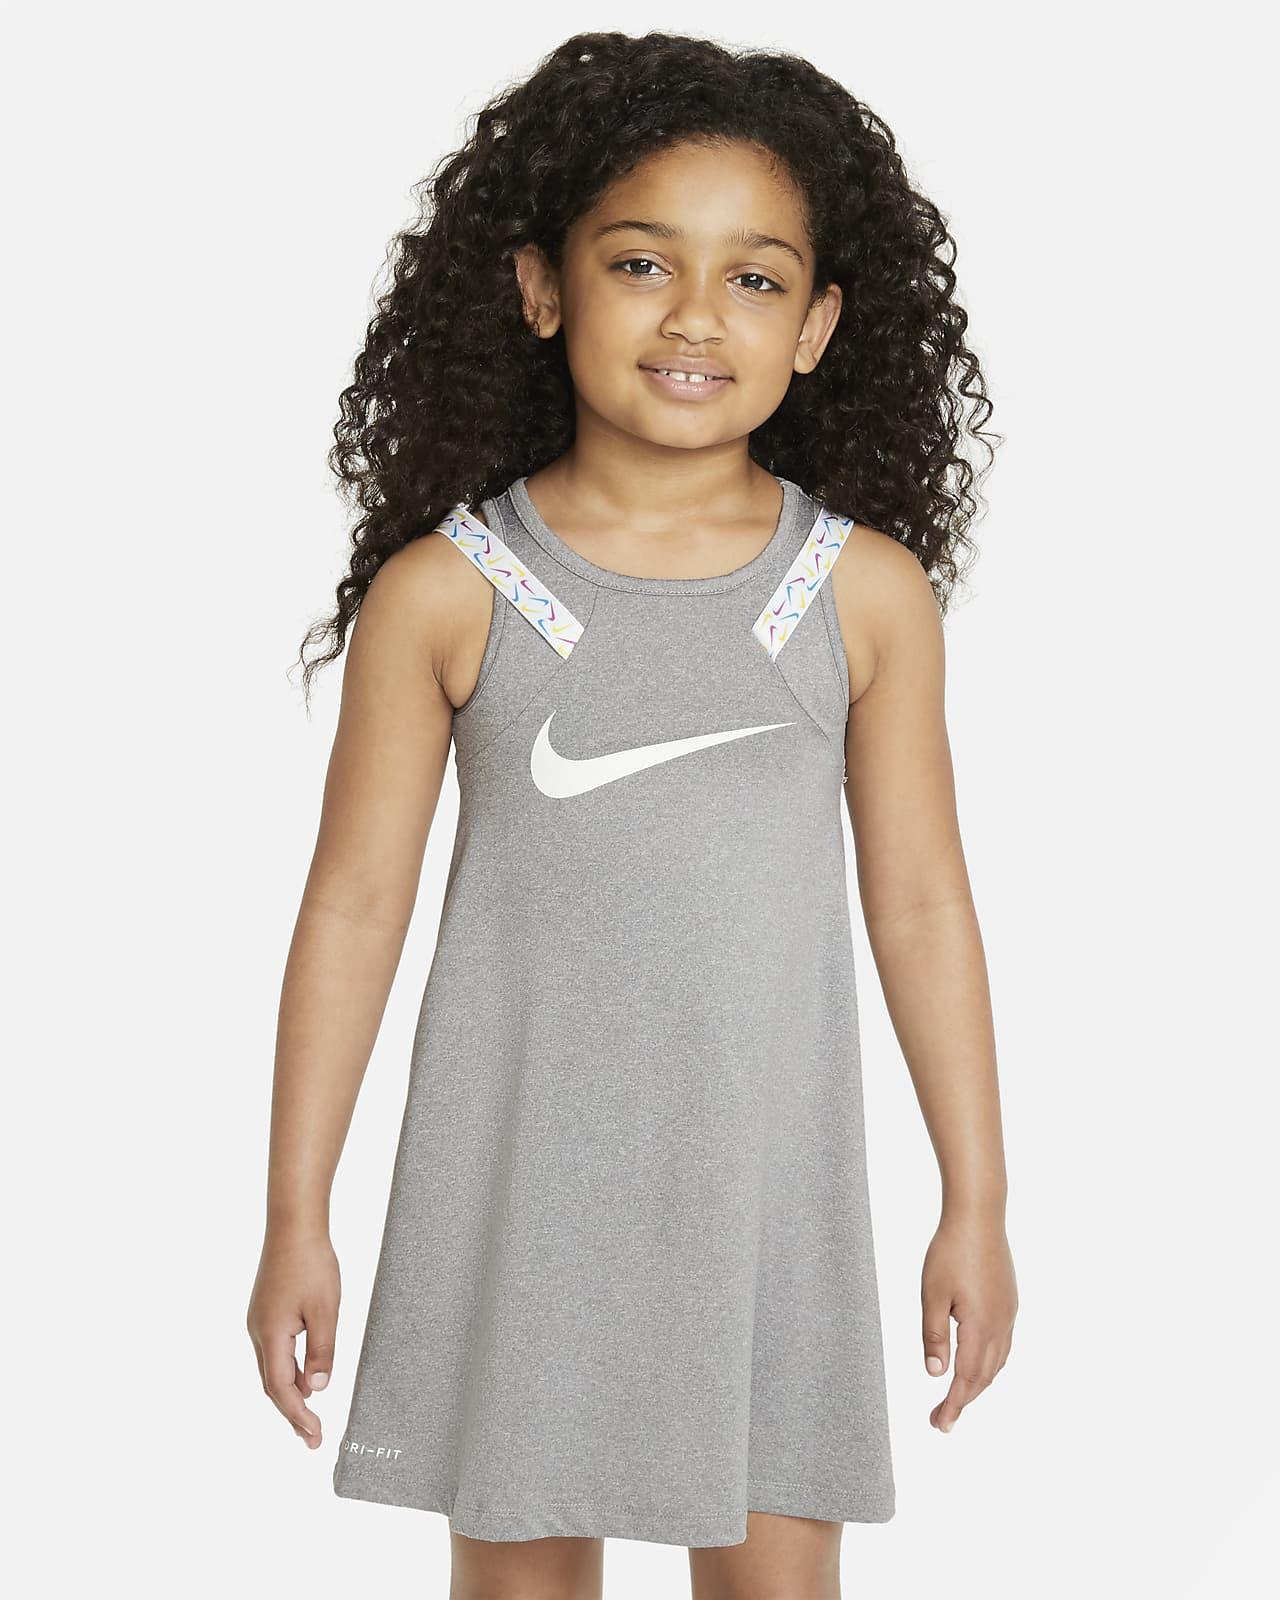 Vestido para niñas talla pequeña Nike Dri-FIT